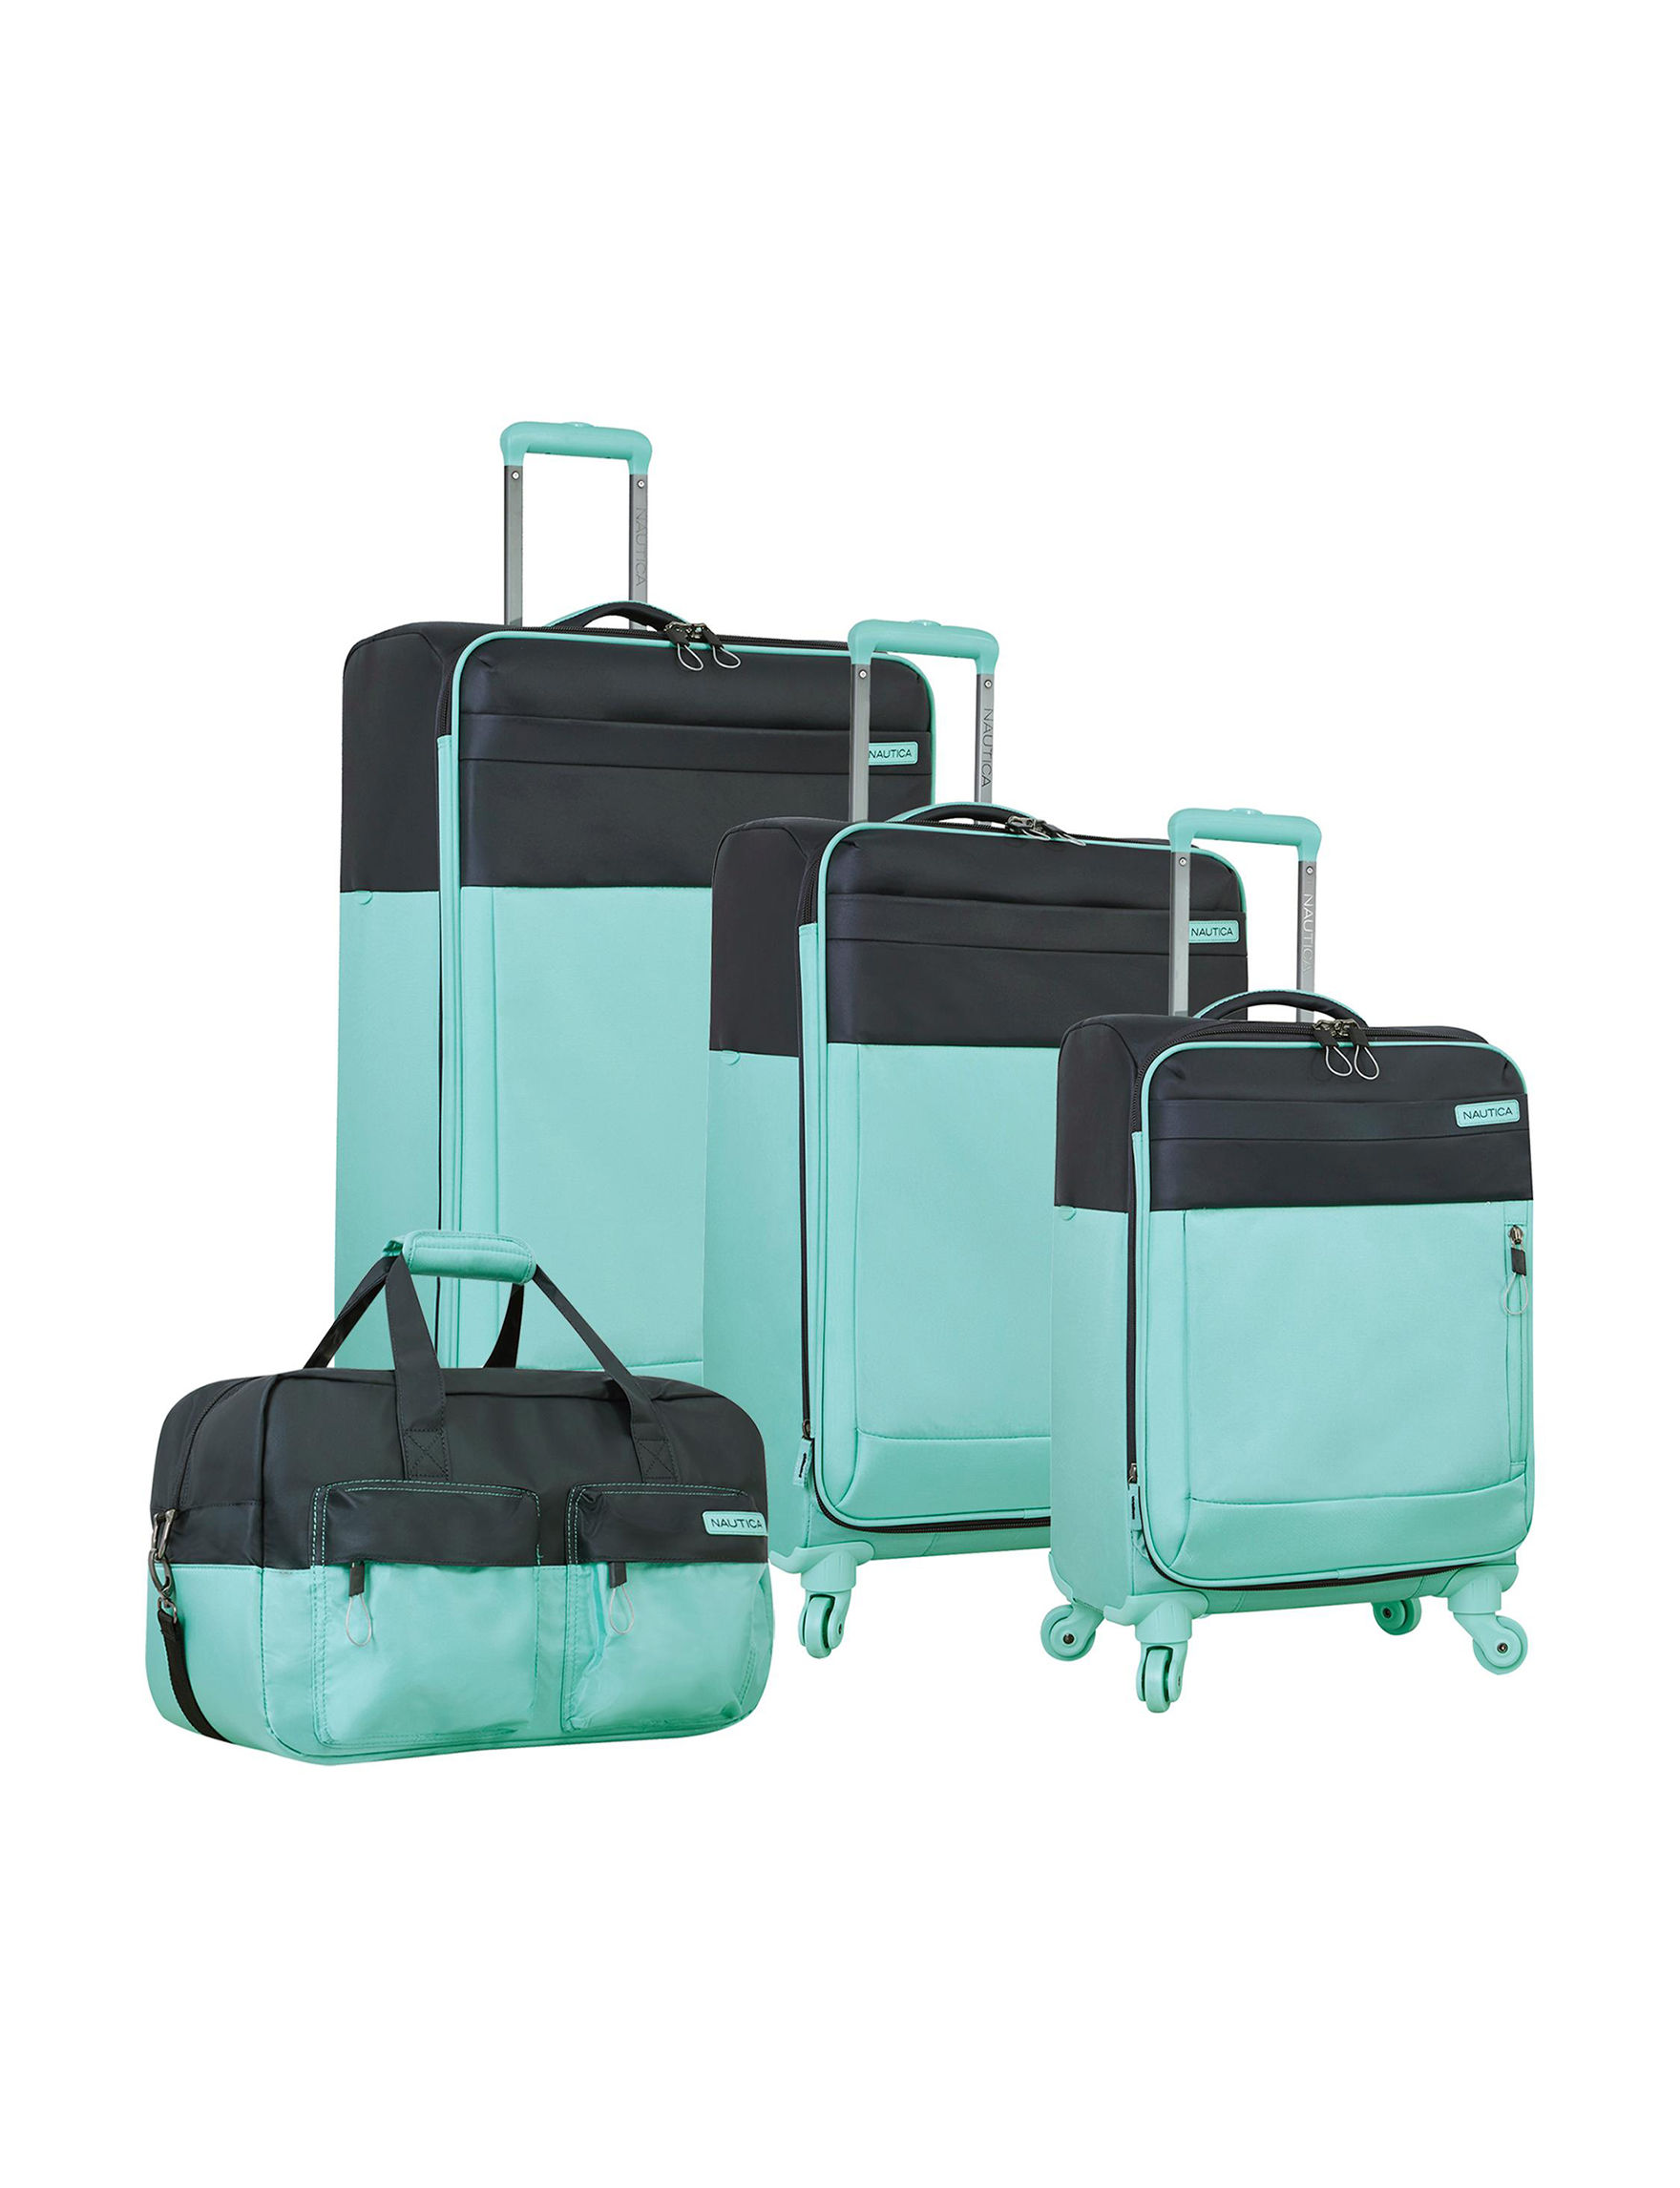 Nautica Aqua Luggage Sets Upright Spinners